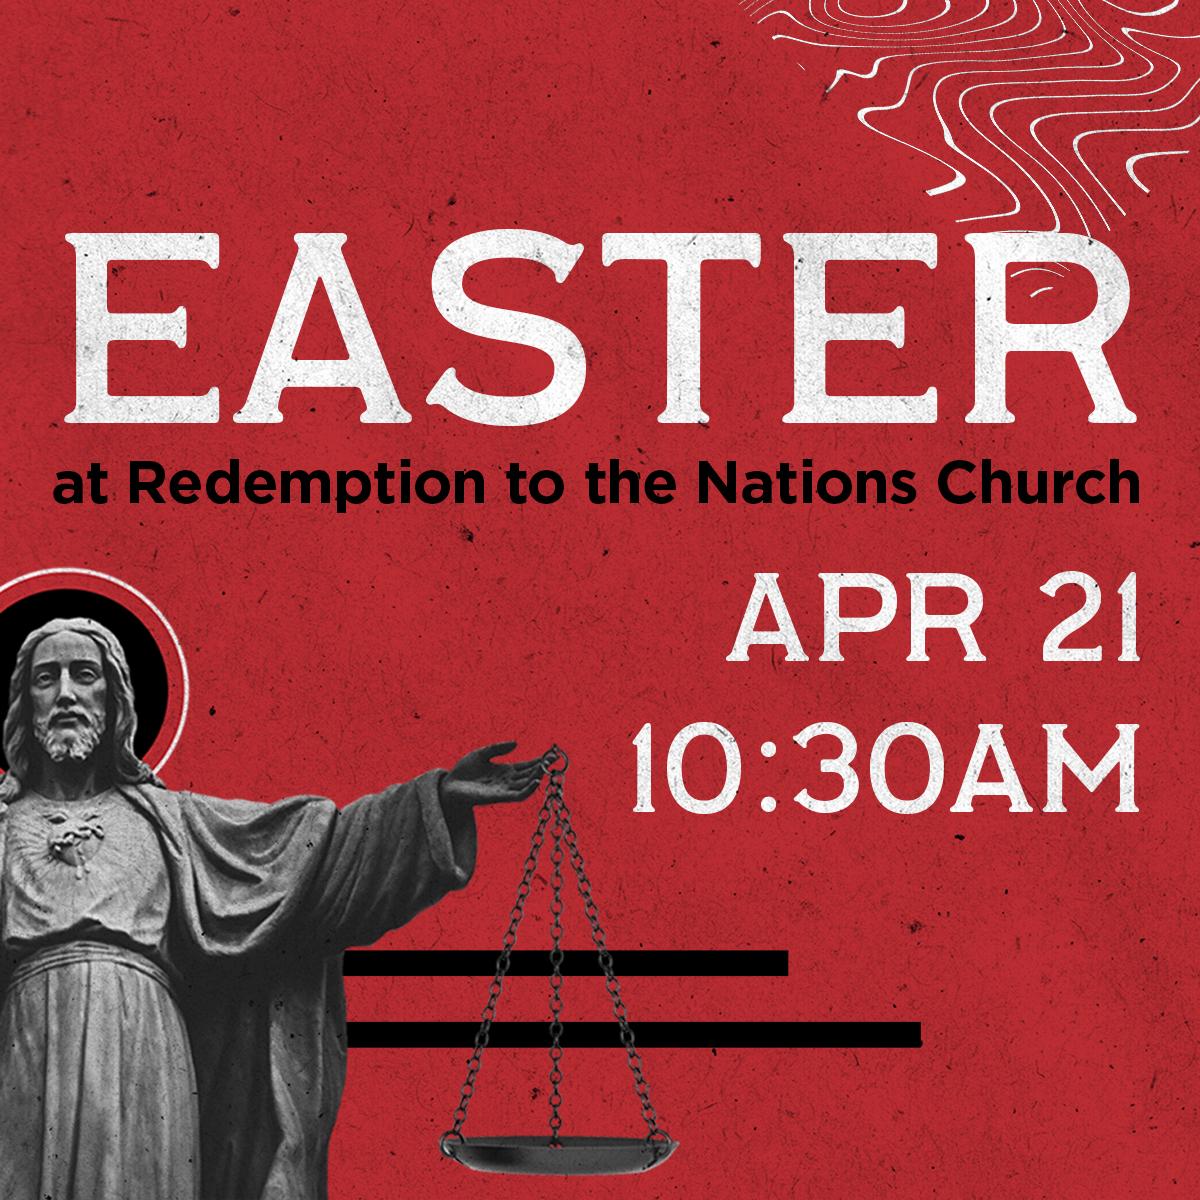 RTTN Easter19 Ad 1200x1200.jpg